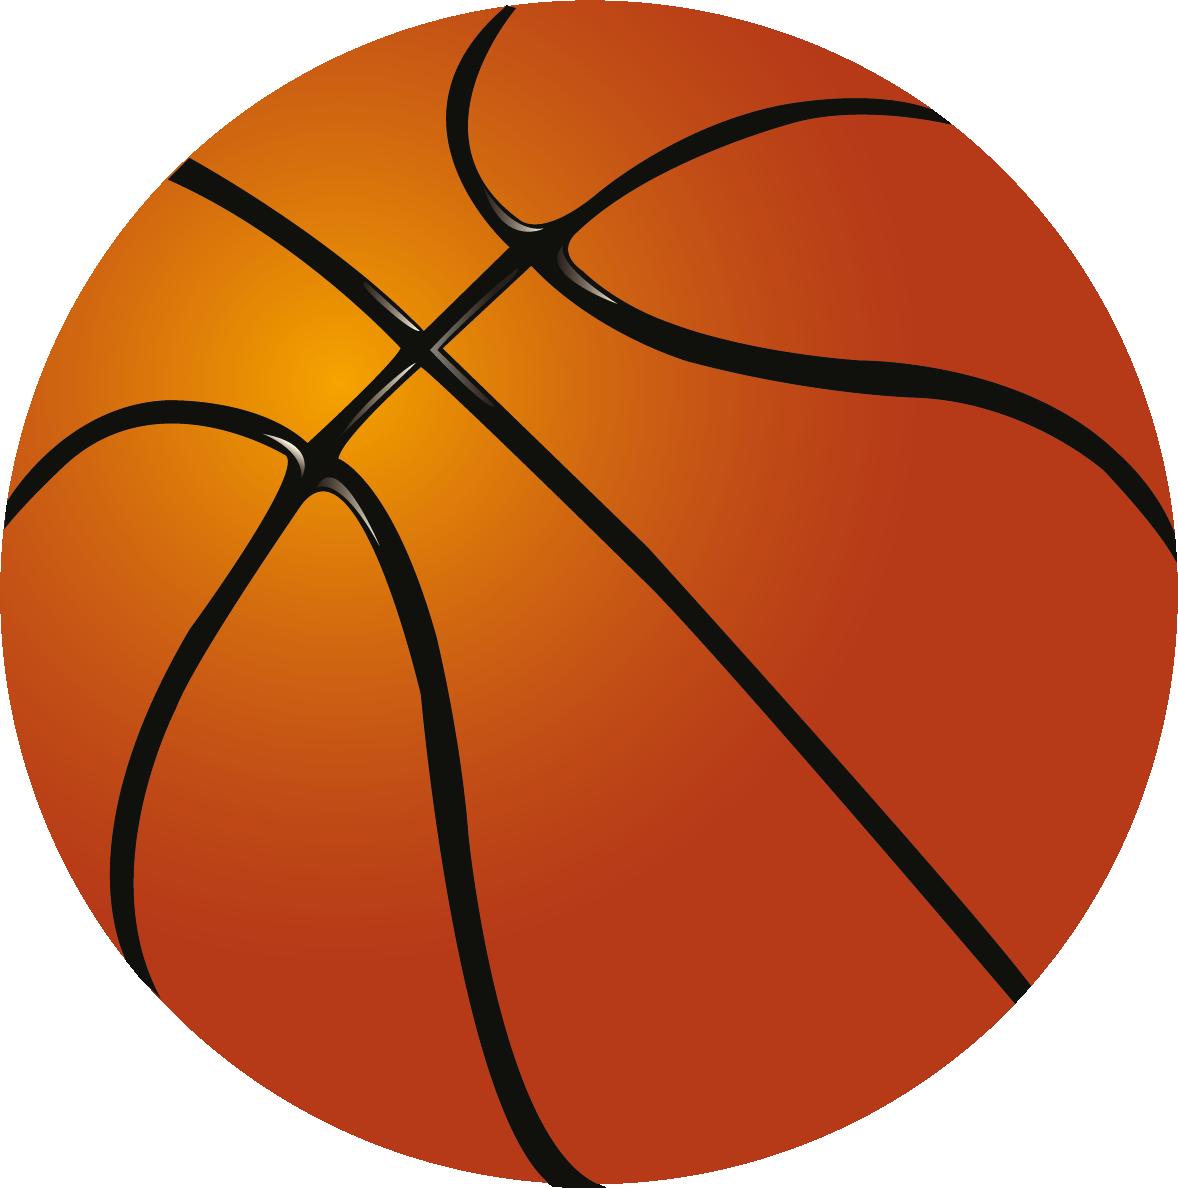 Clipart Ball-Clipart Ball-16